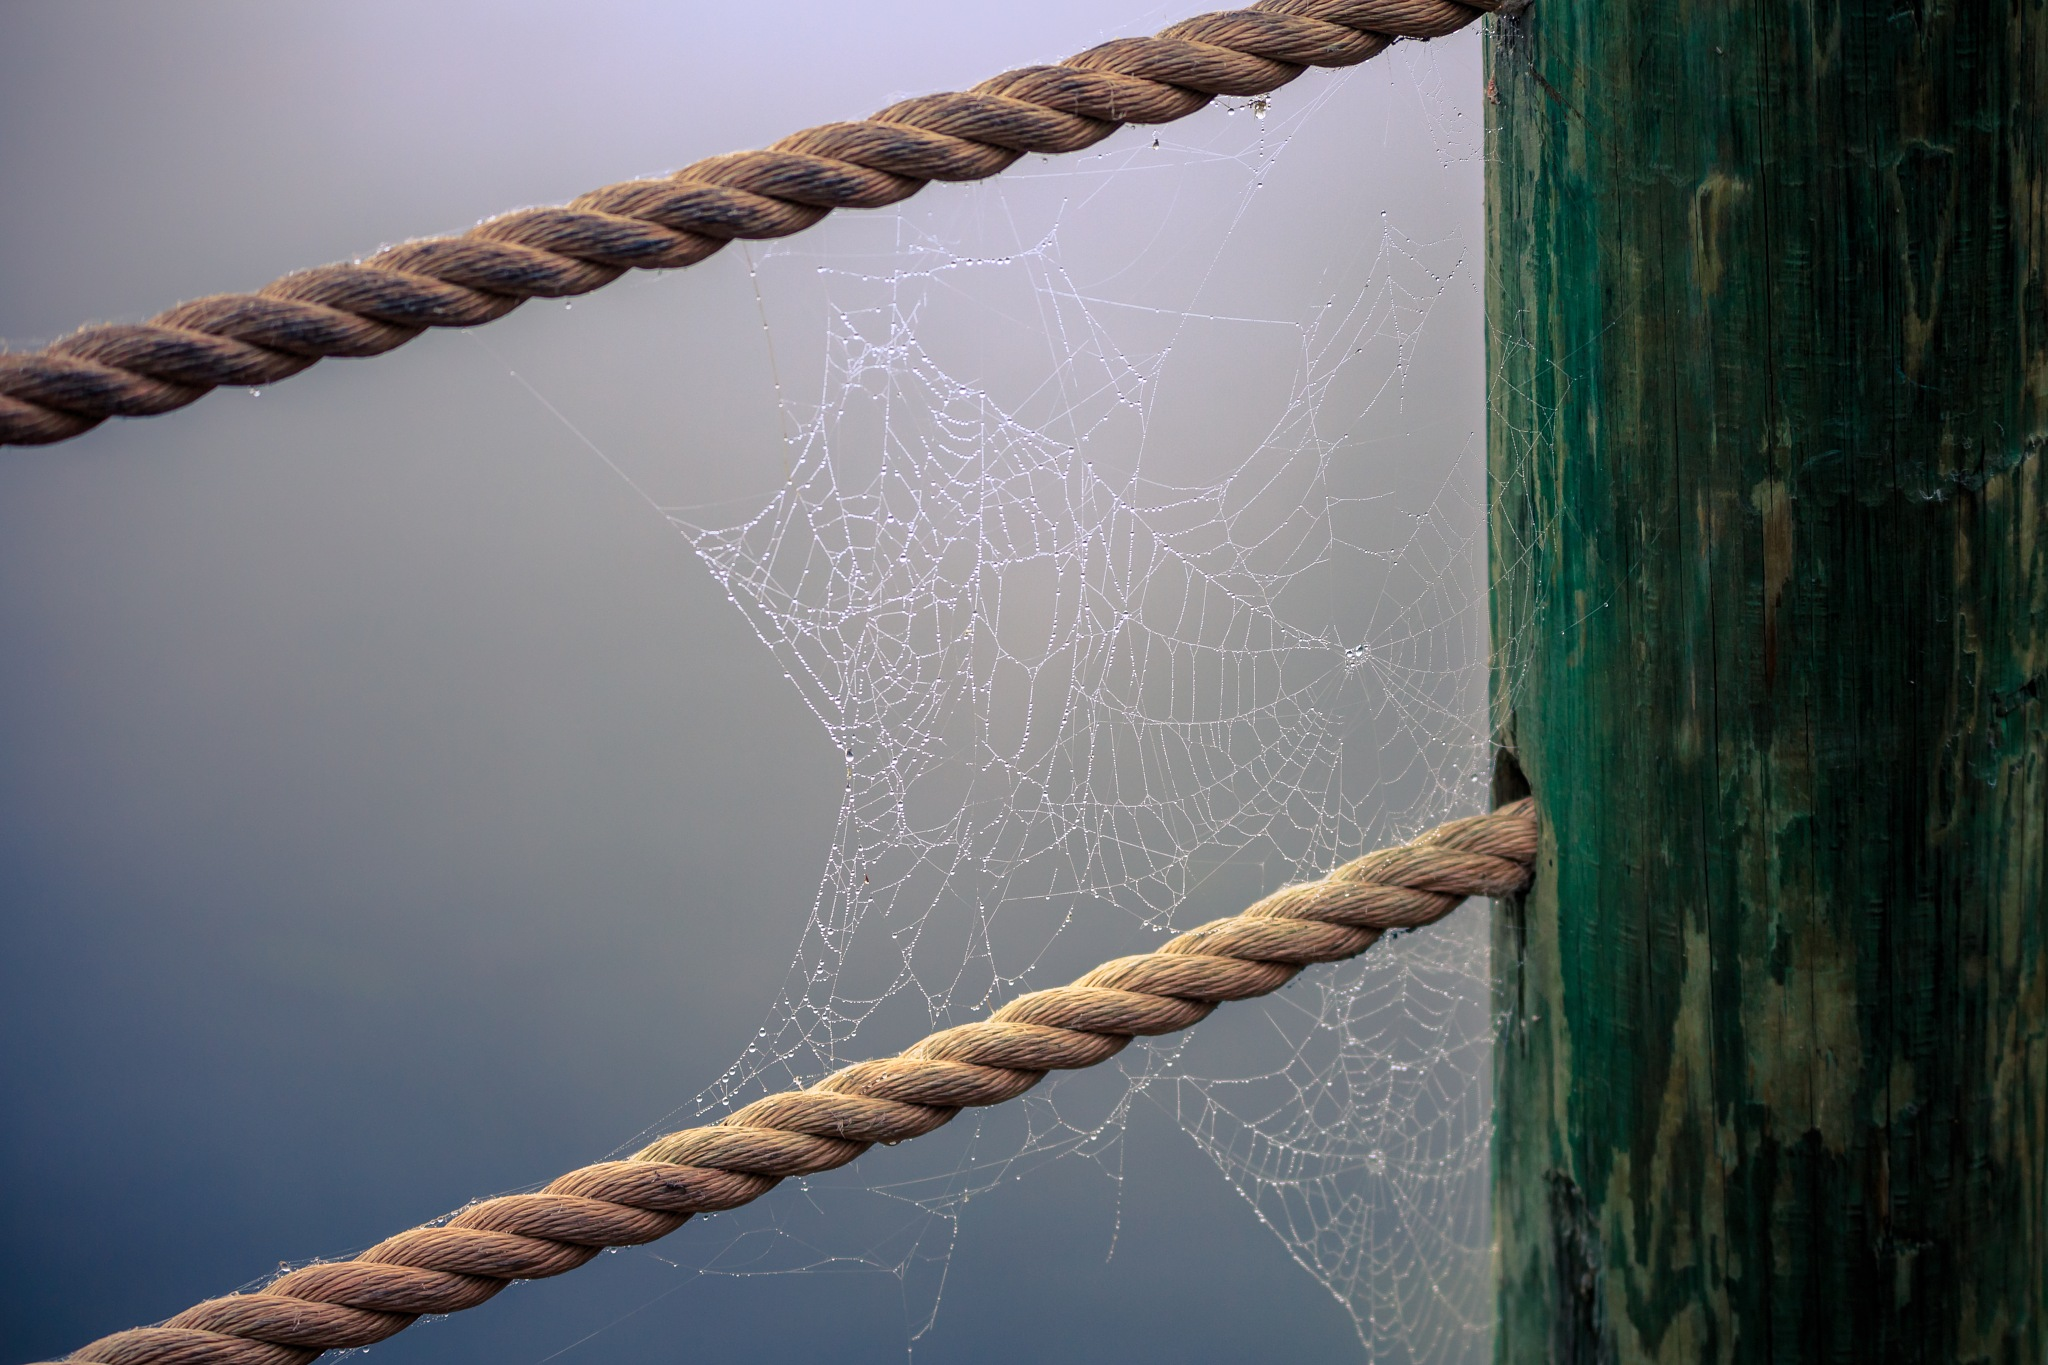 Web by Bryan L. Williams